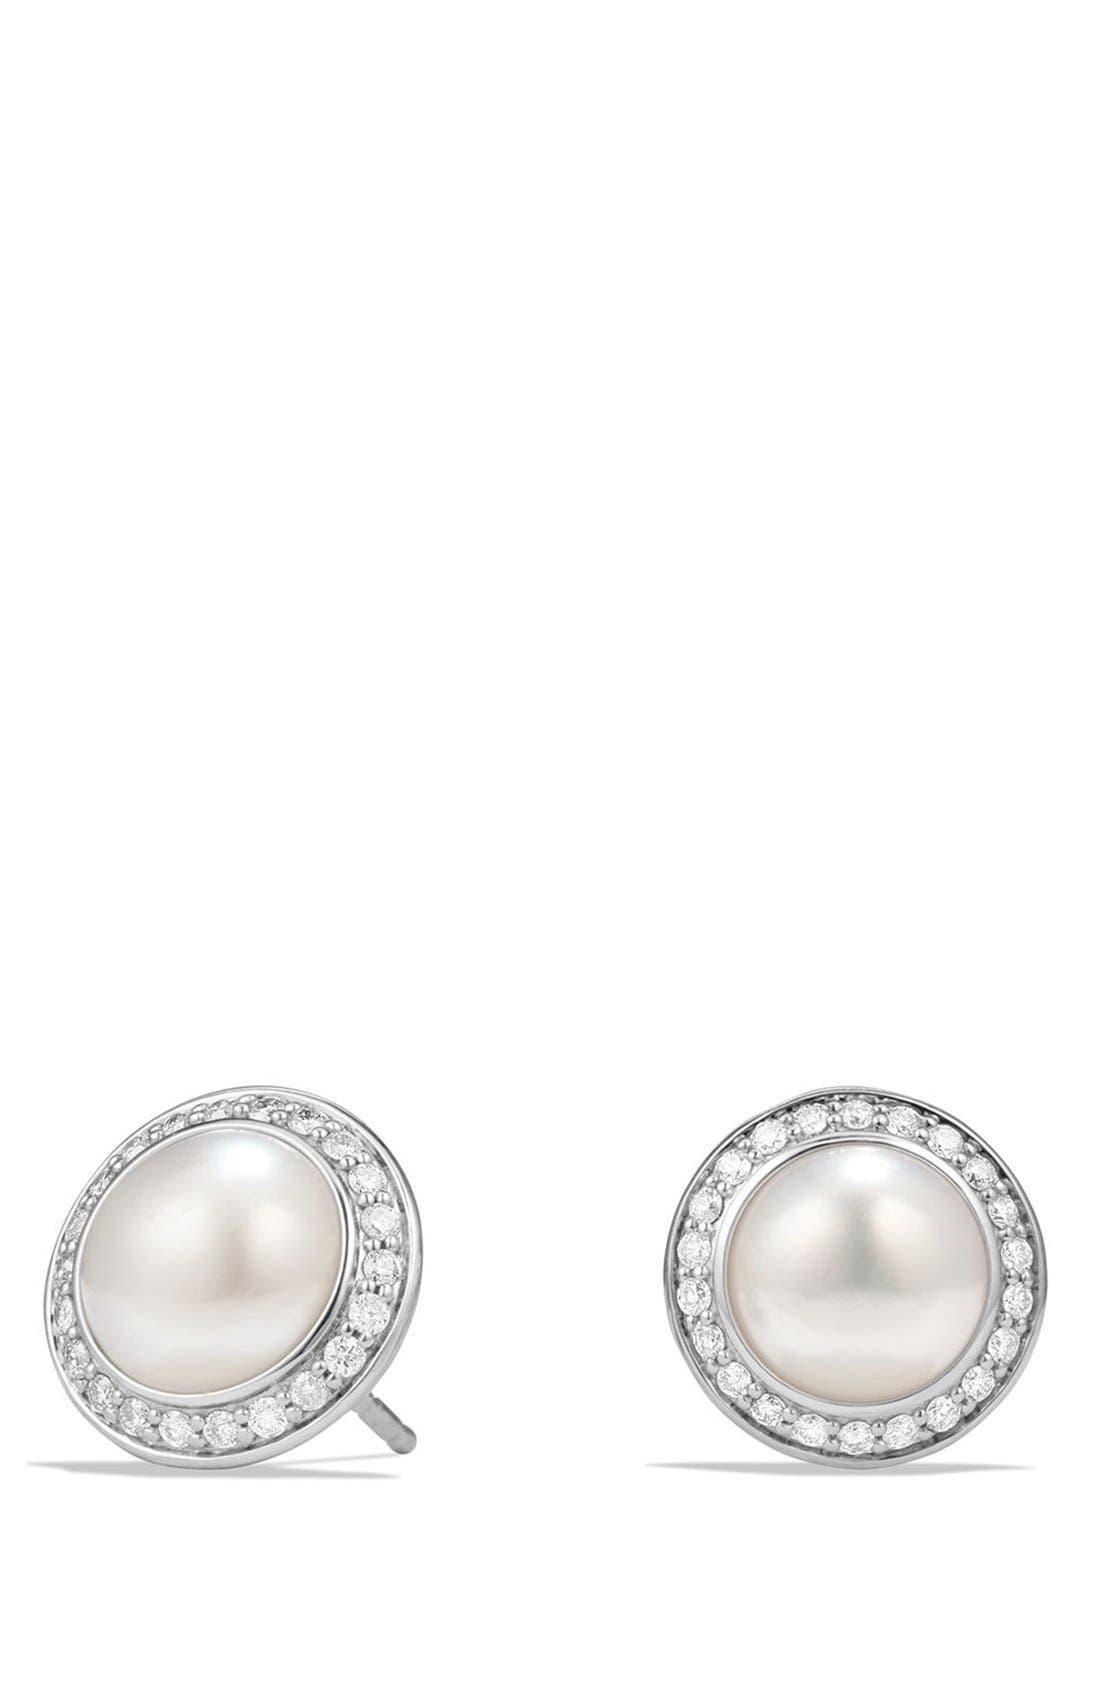 DAVID YURMAN Cerise Petite Earrings with Pearls and Diamonds